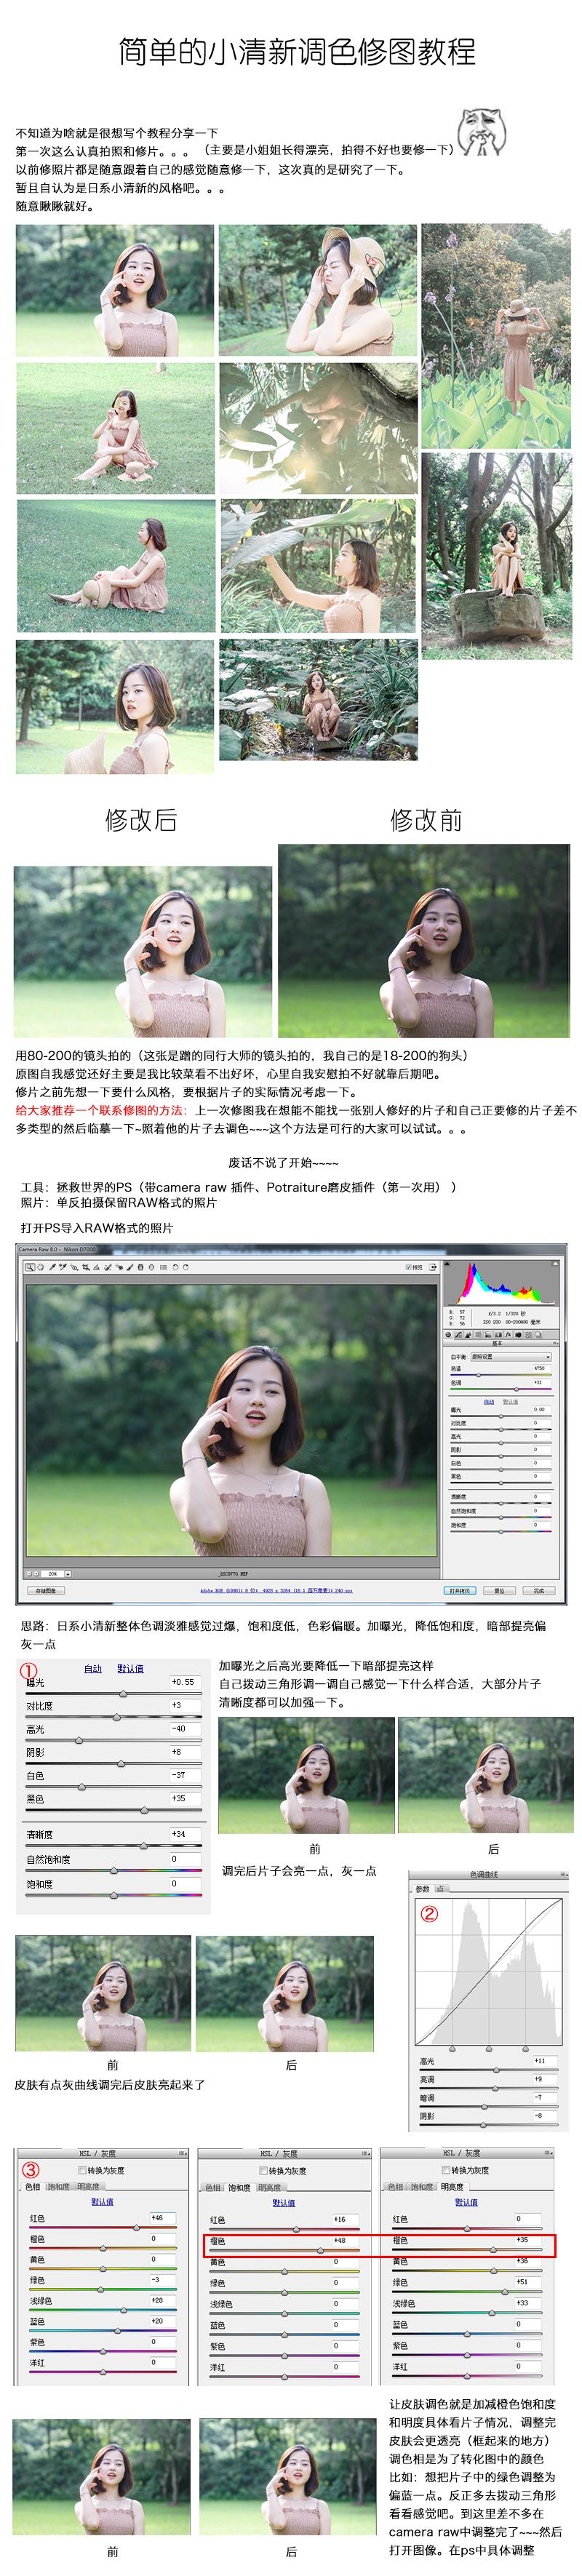 Photoshop细致解析人像小清新调色修图教程